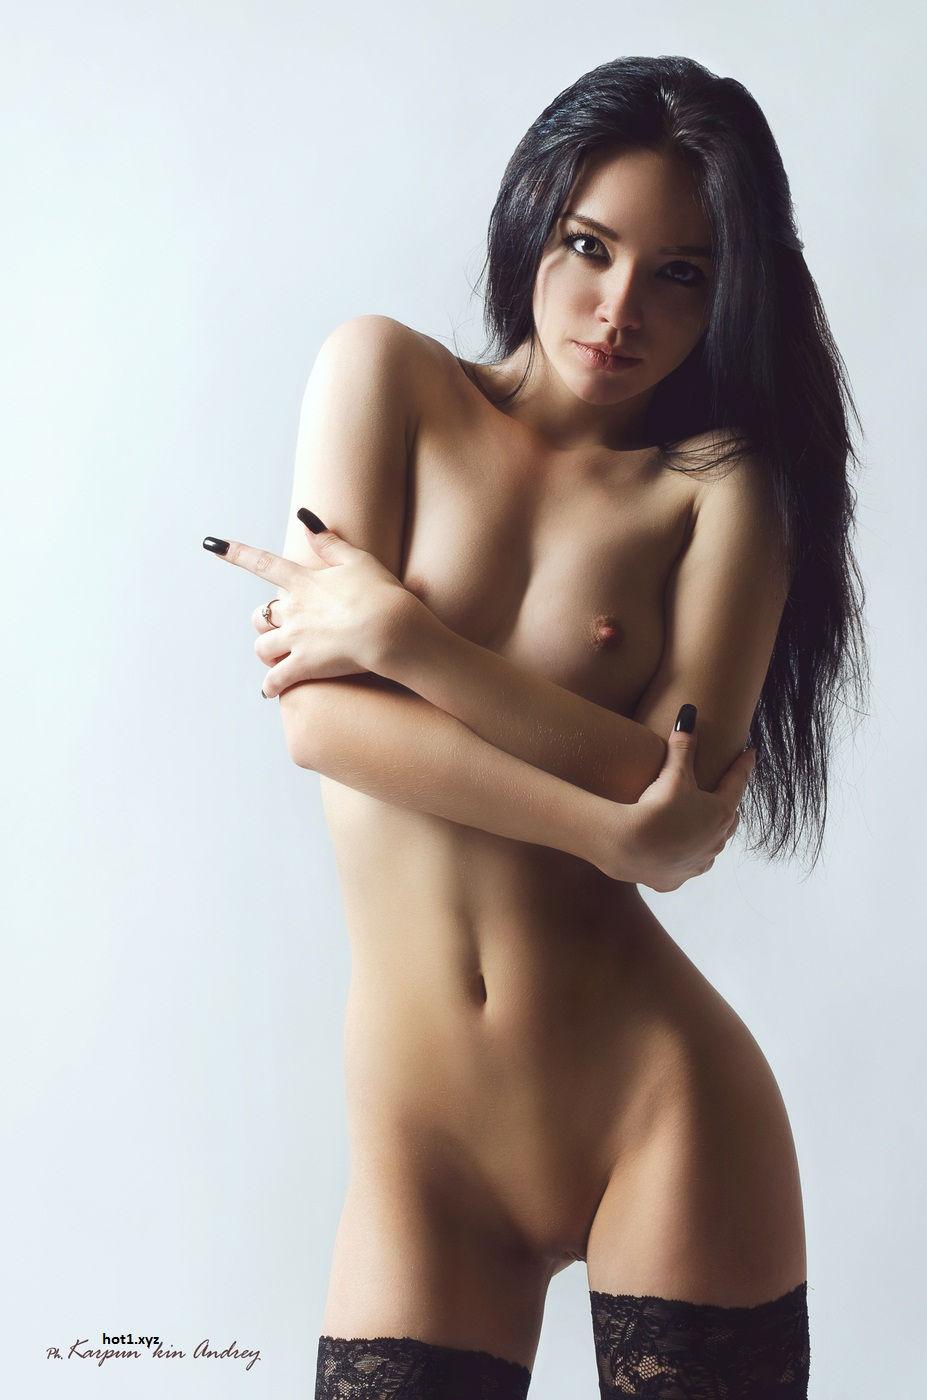 Nudest women